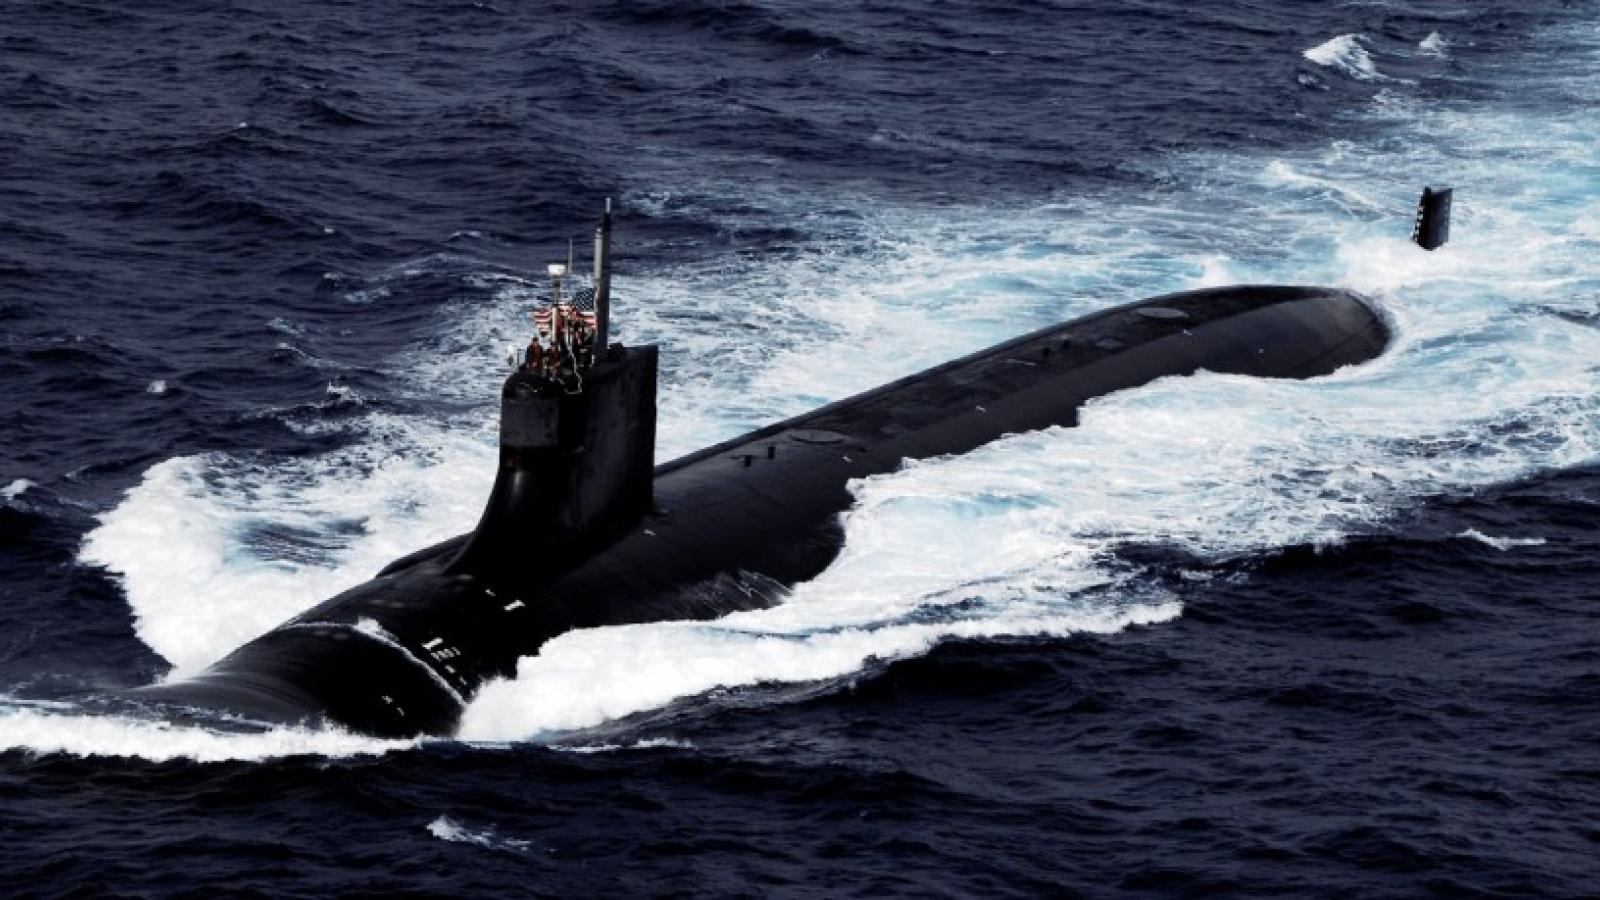 Vietnam responds to incident involving US submarines in East Sea